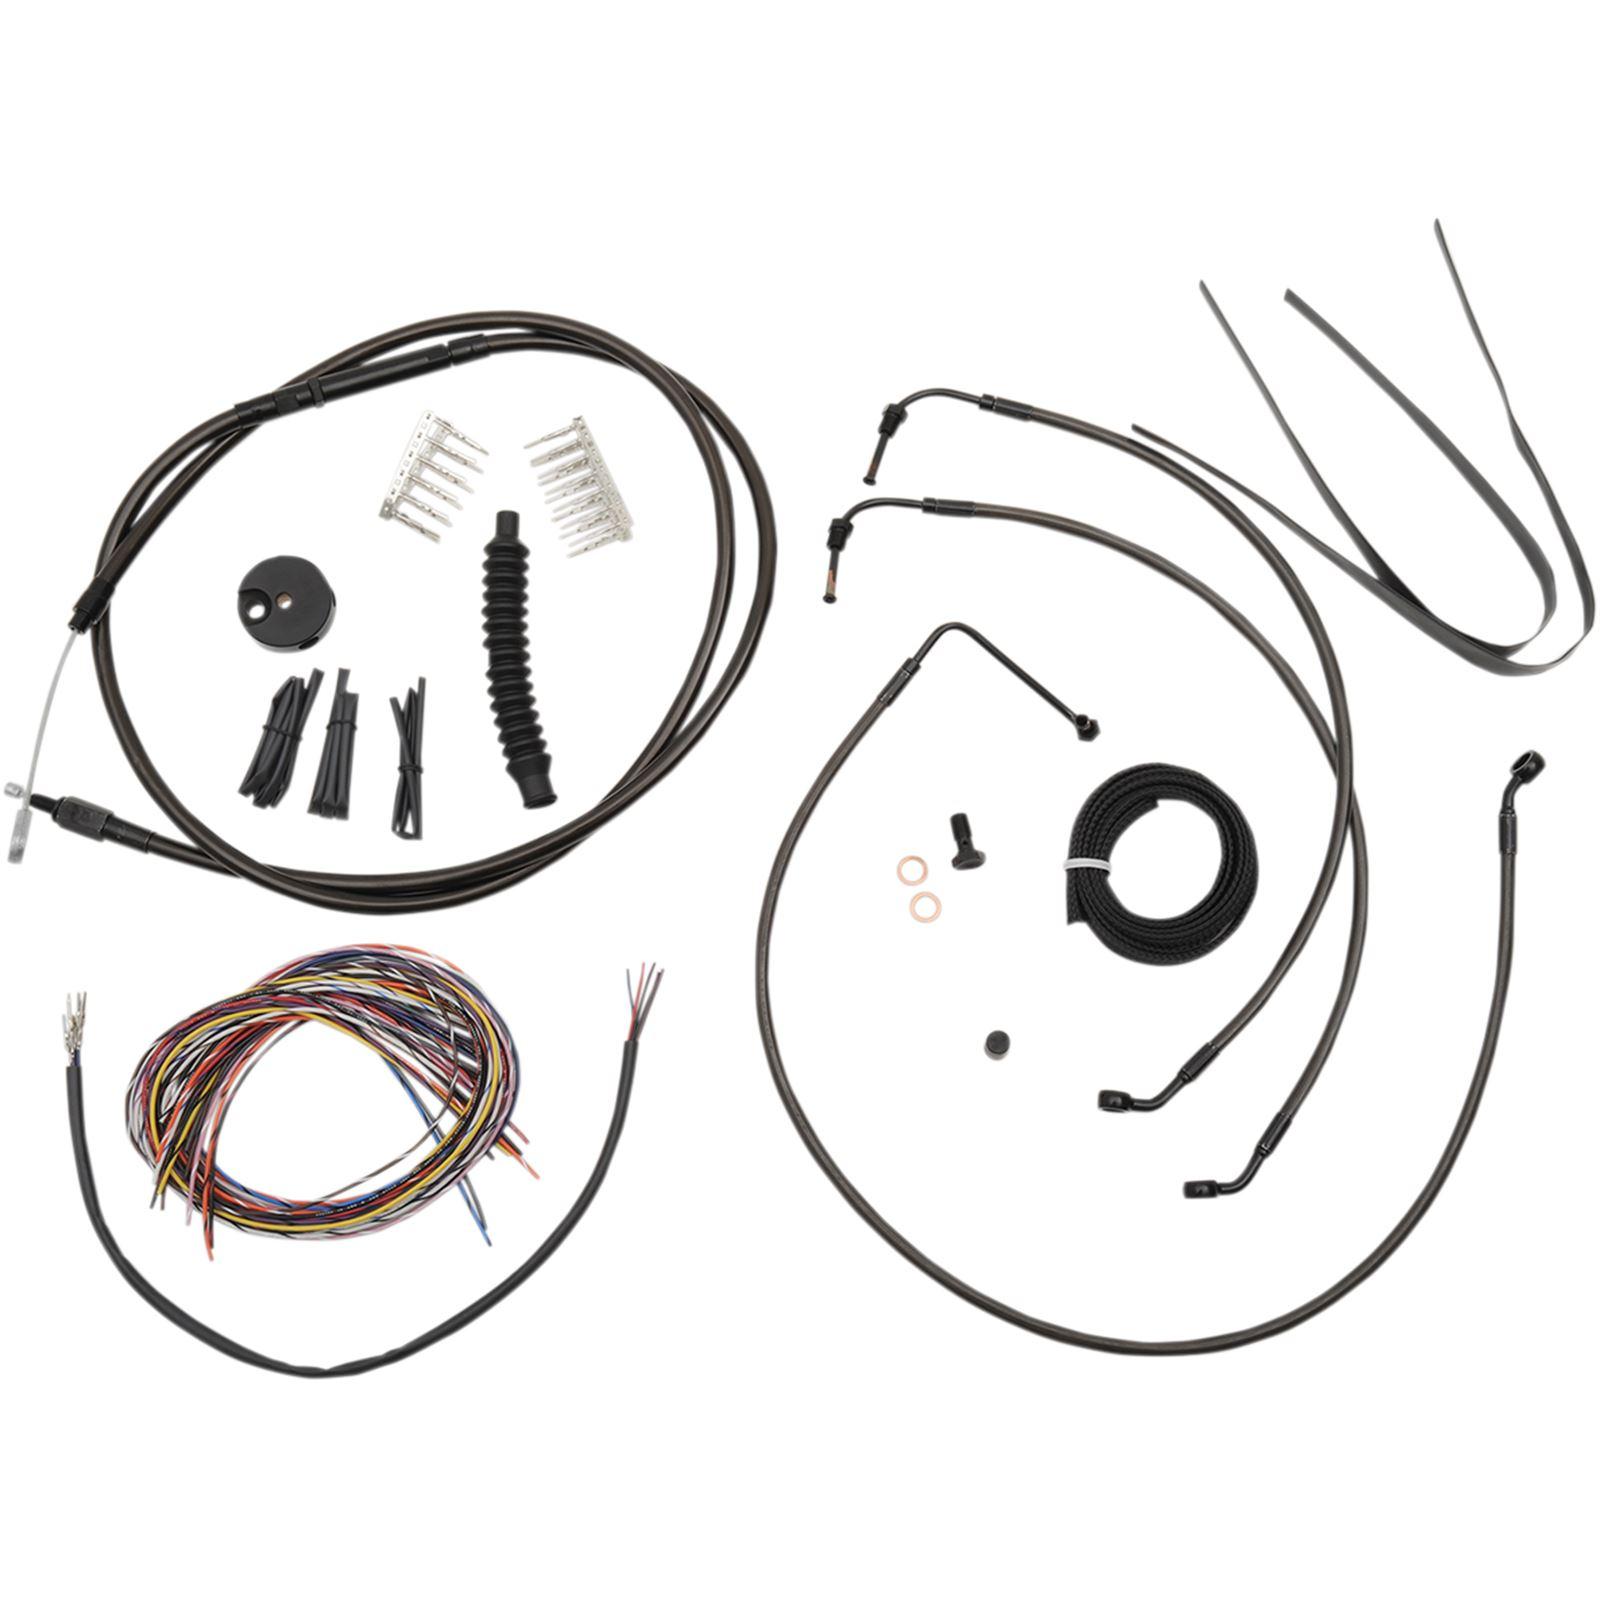 "LA Choppers Midnight Cable Kit for 15"" - 17"" Ape Hanger Handlebars"